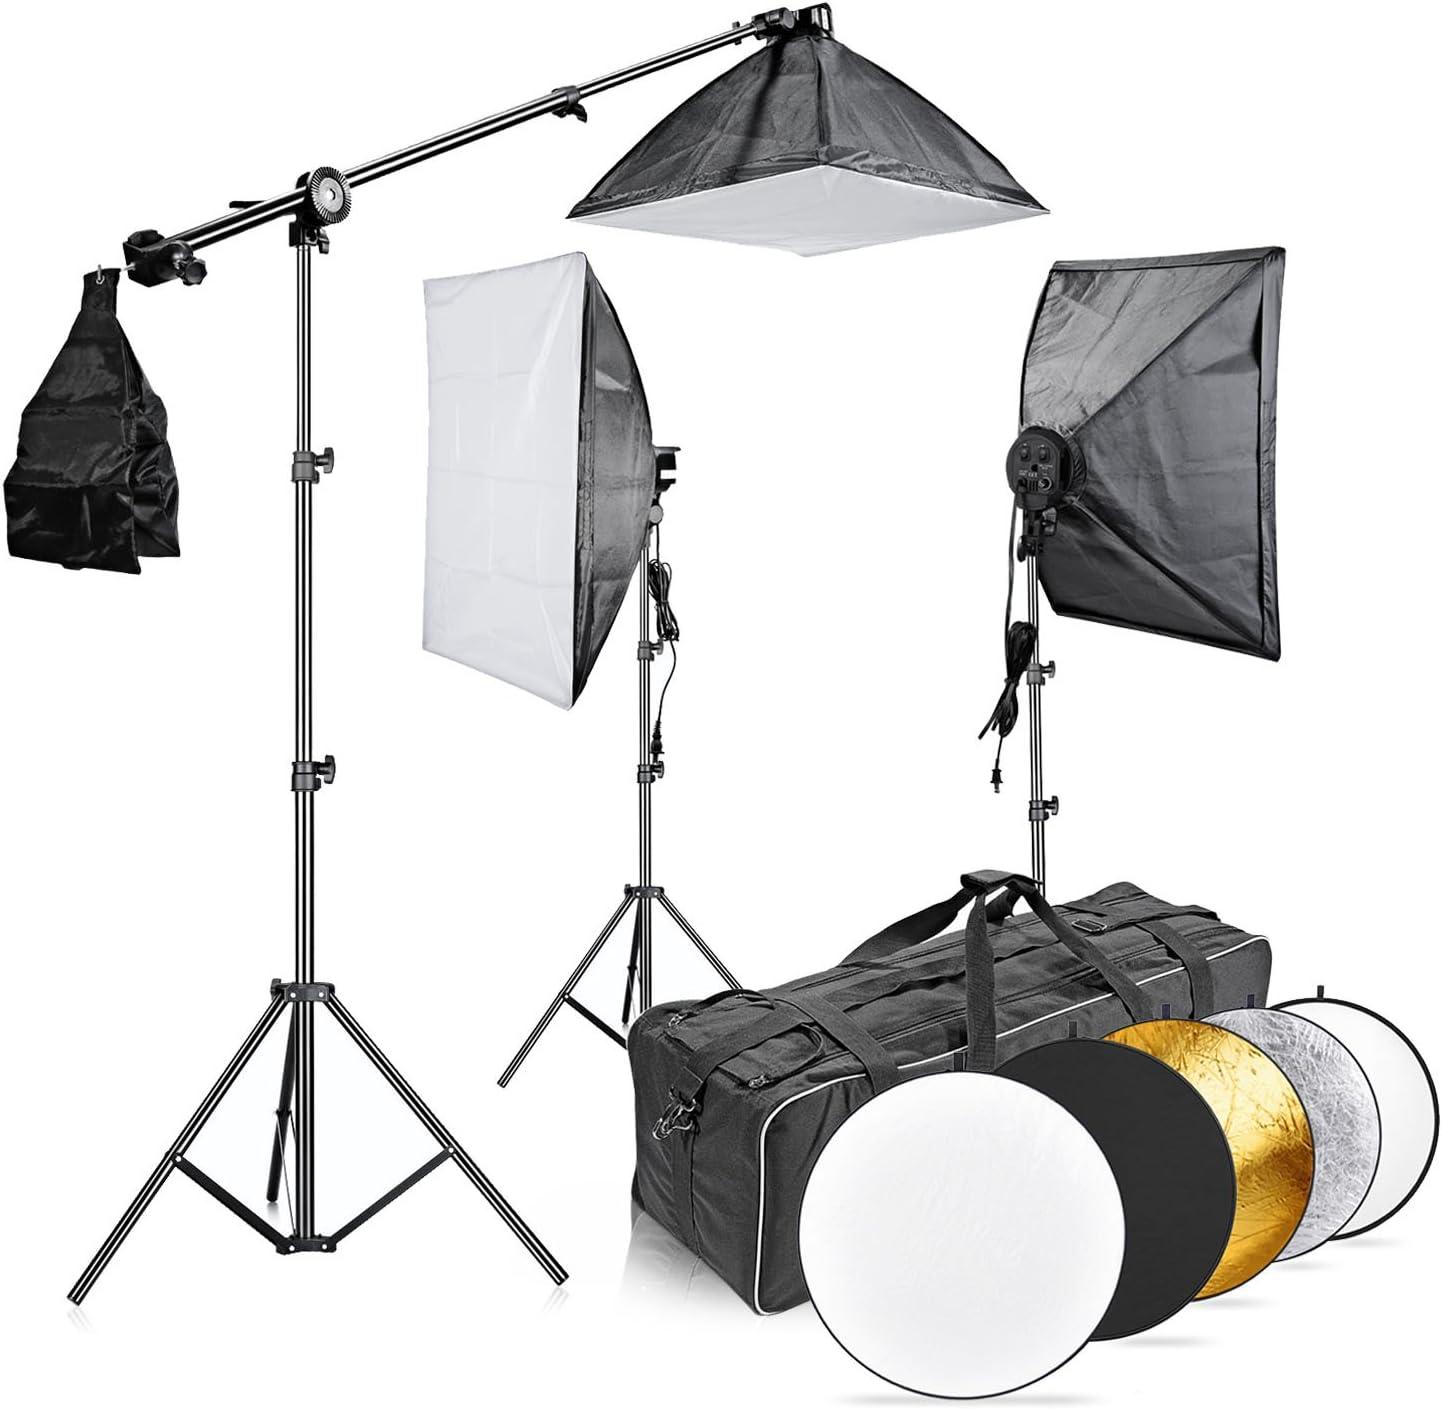 CanadianStudio 4 Socket Photography Lighting Softbox 20 x 28 Light Softbox Reflector with 4 Socket Light Bulb Adaptor